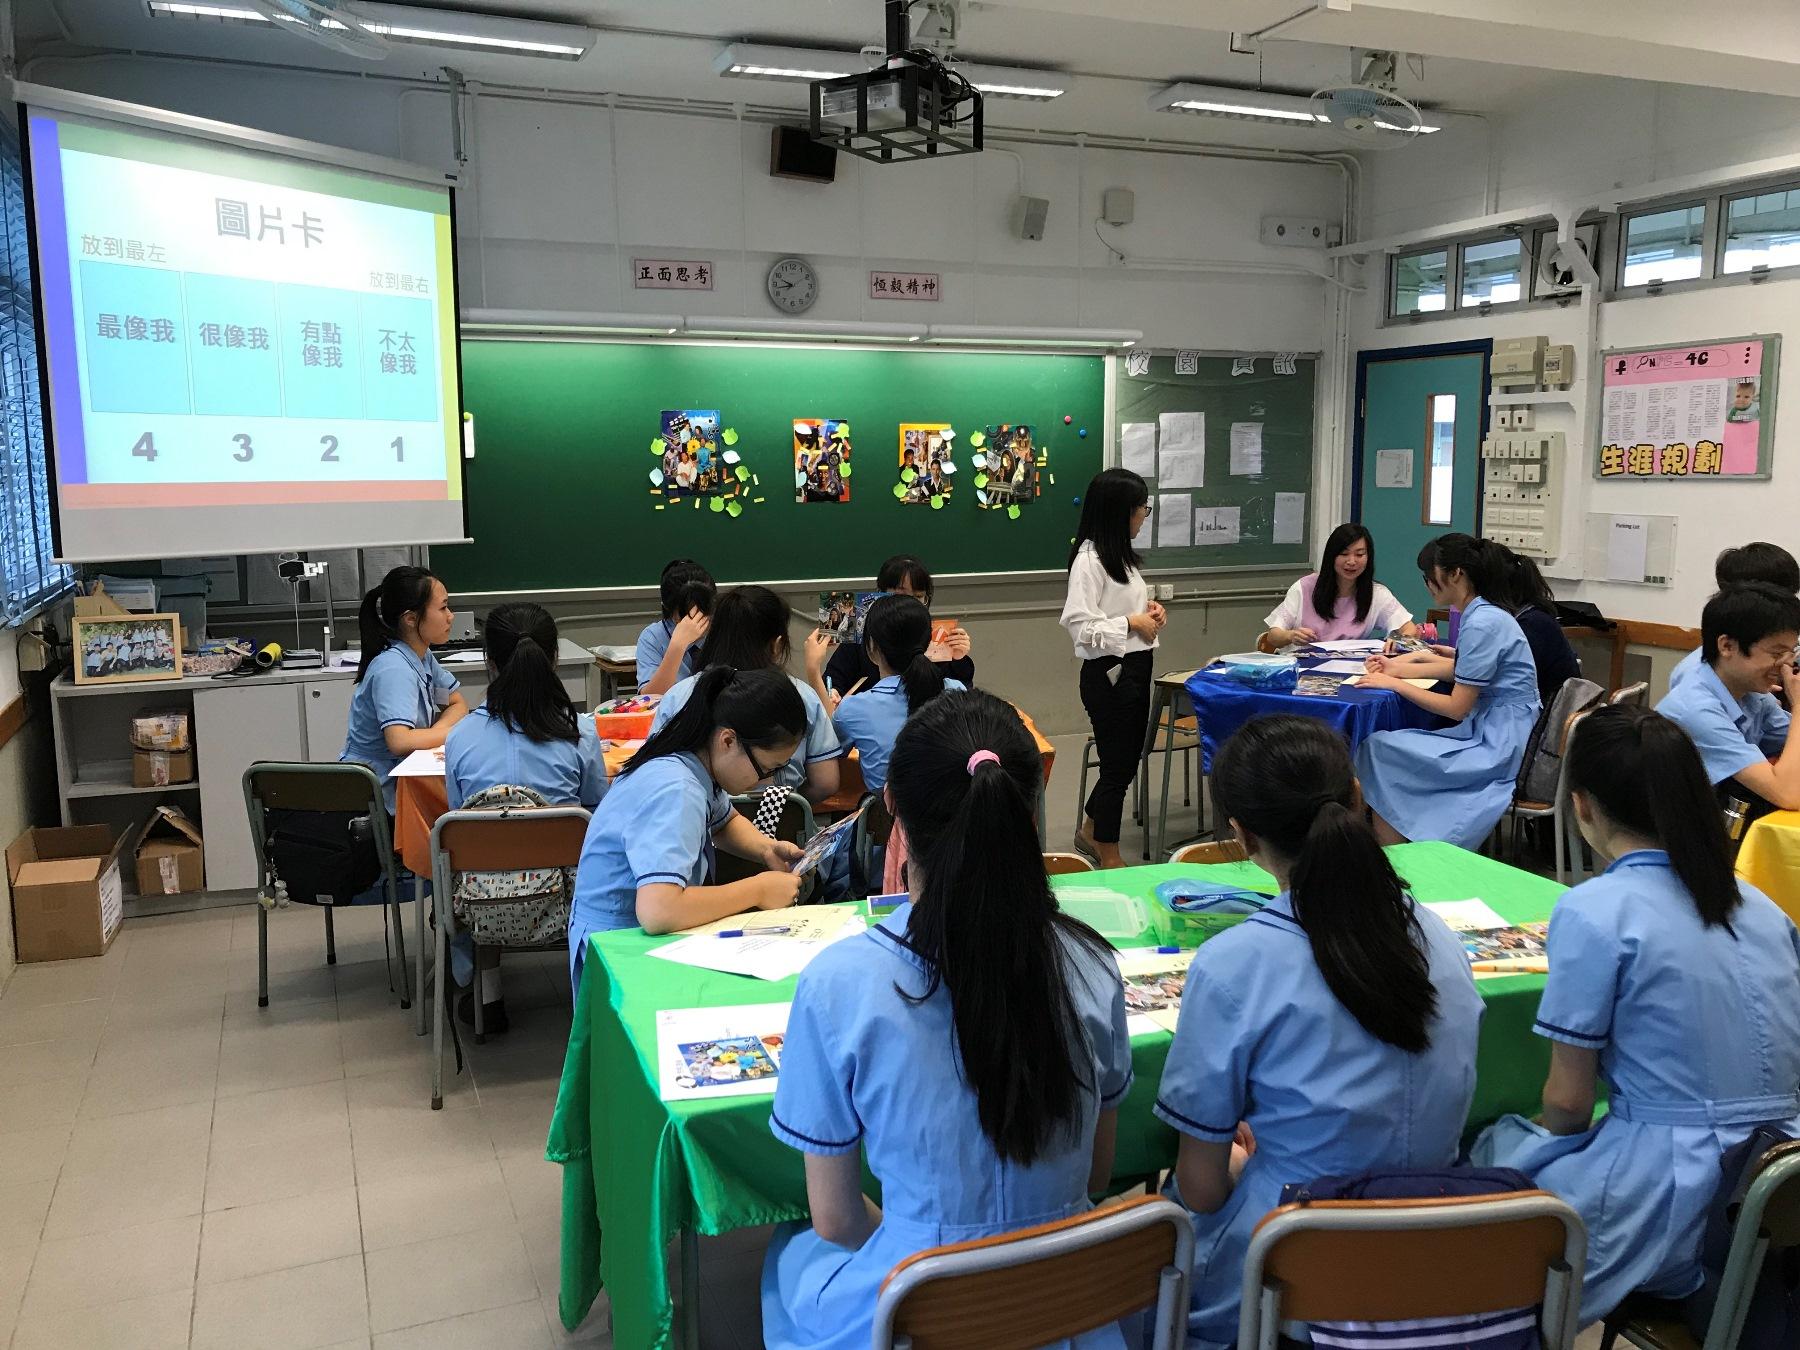 http://npc.edu.hk/sites/default/files/img_4342_2.jpg